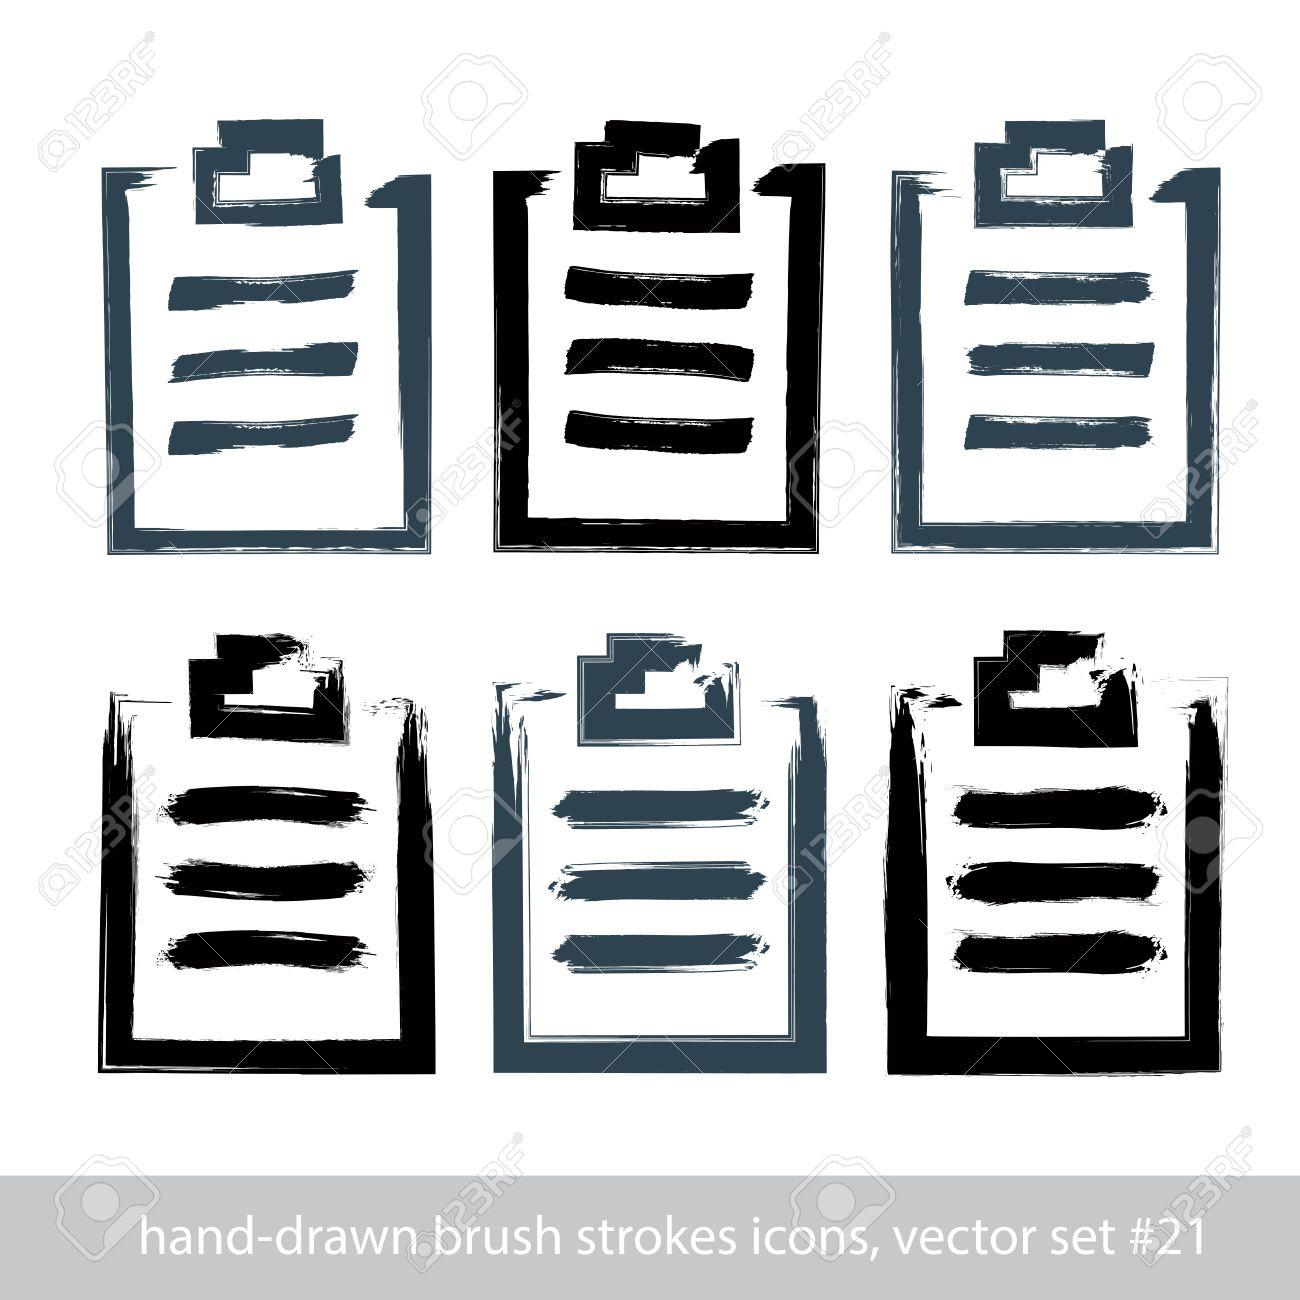 1300x1300 Set Of Hand Drawn Simple Prescription Pads, Brush Drawing Medicine